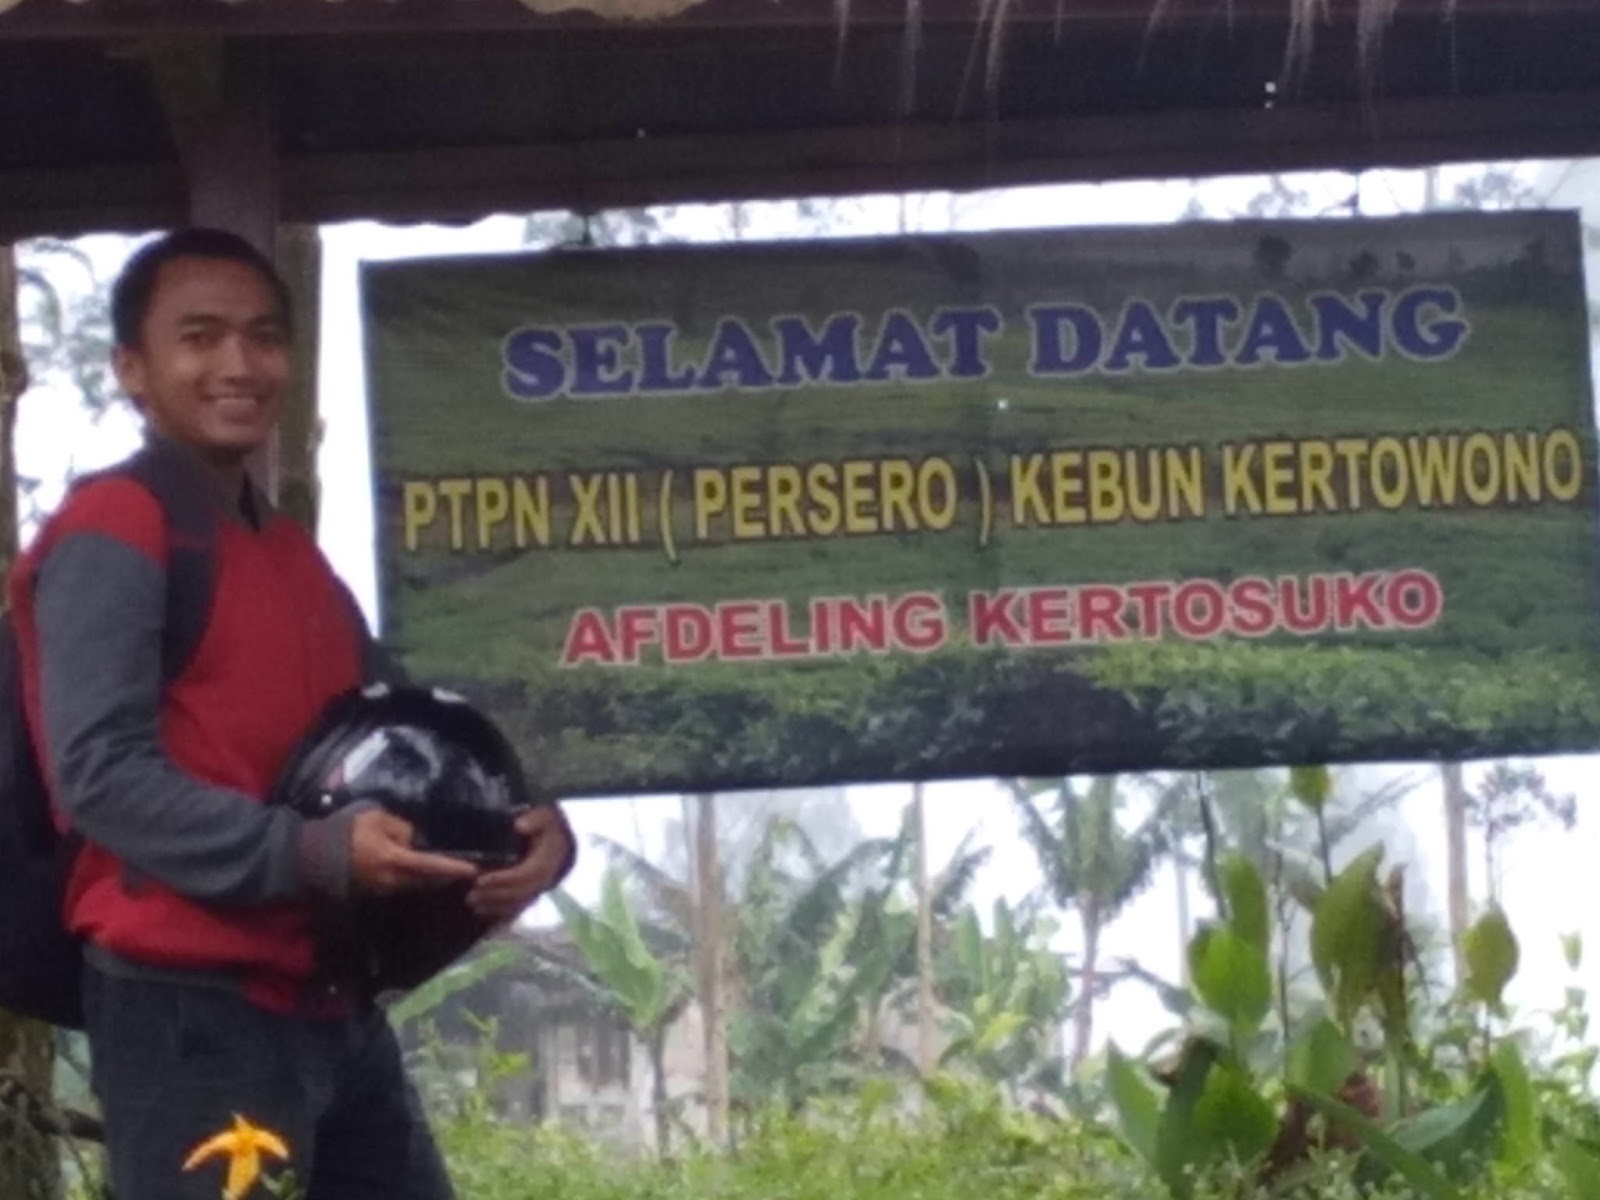 Teh Kertowono Hangoutbareng Konon Katanya Desa Bagus Beudd Dikala Senja